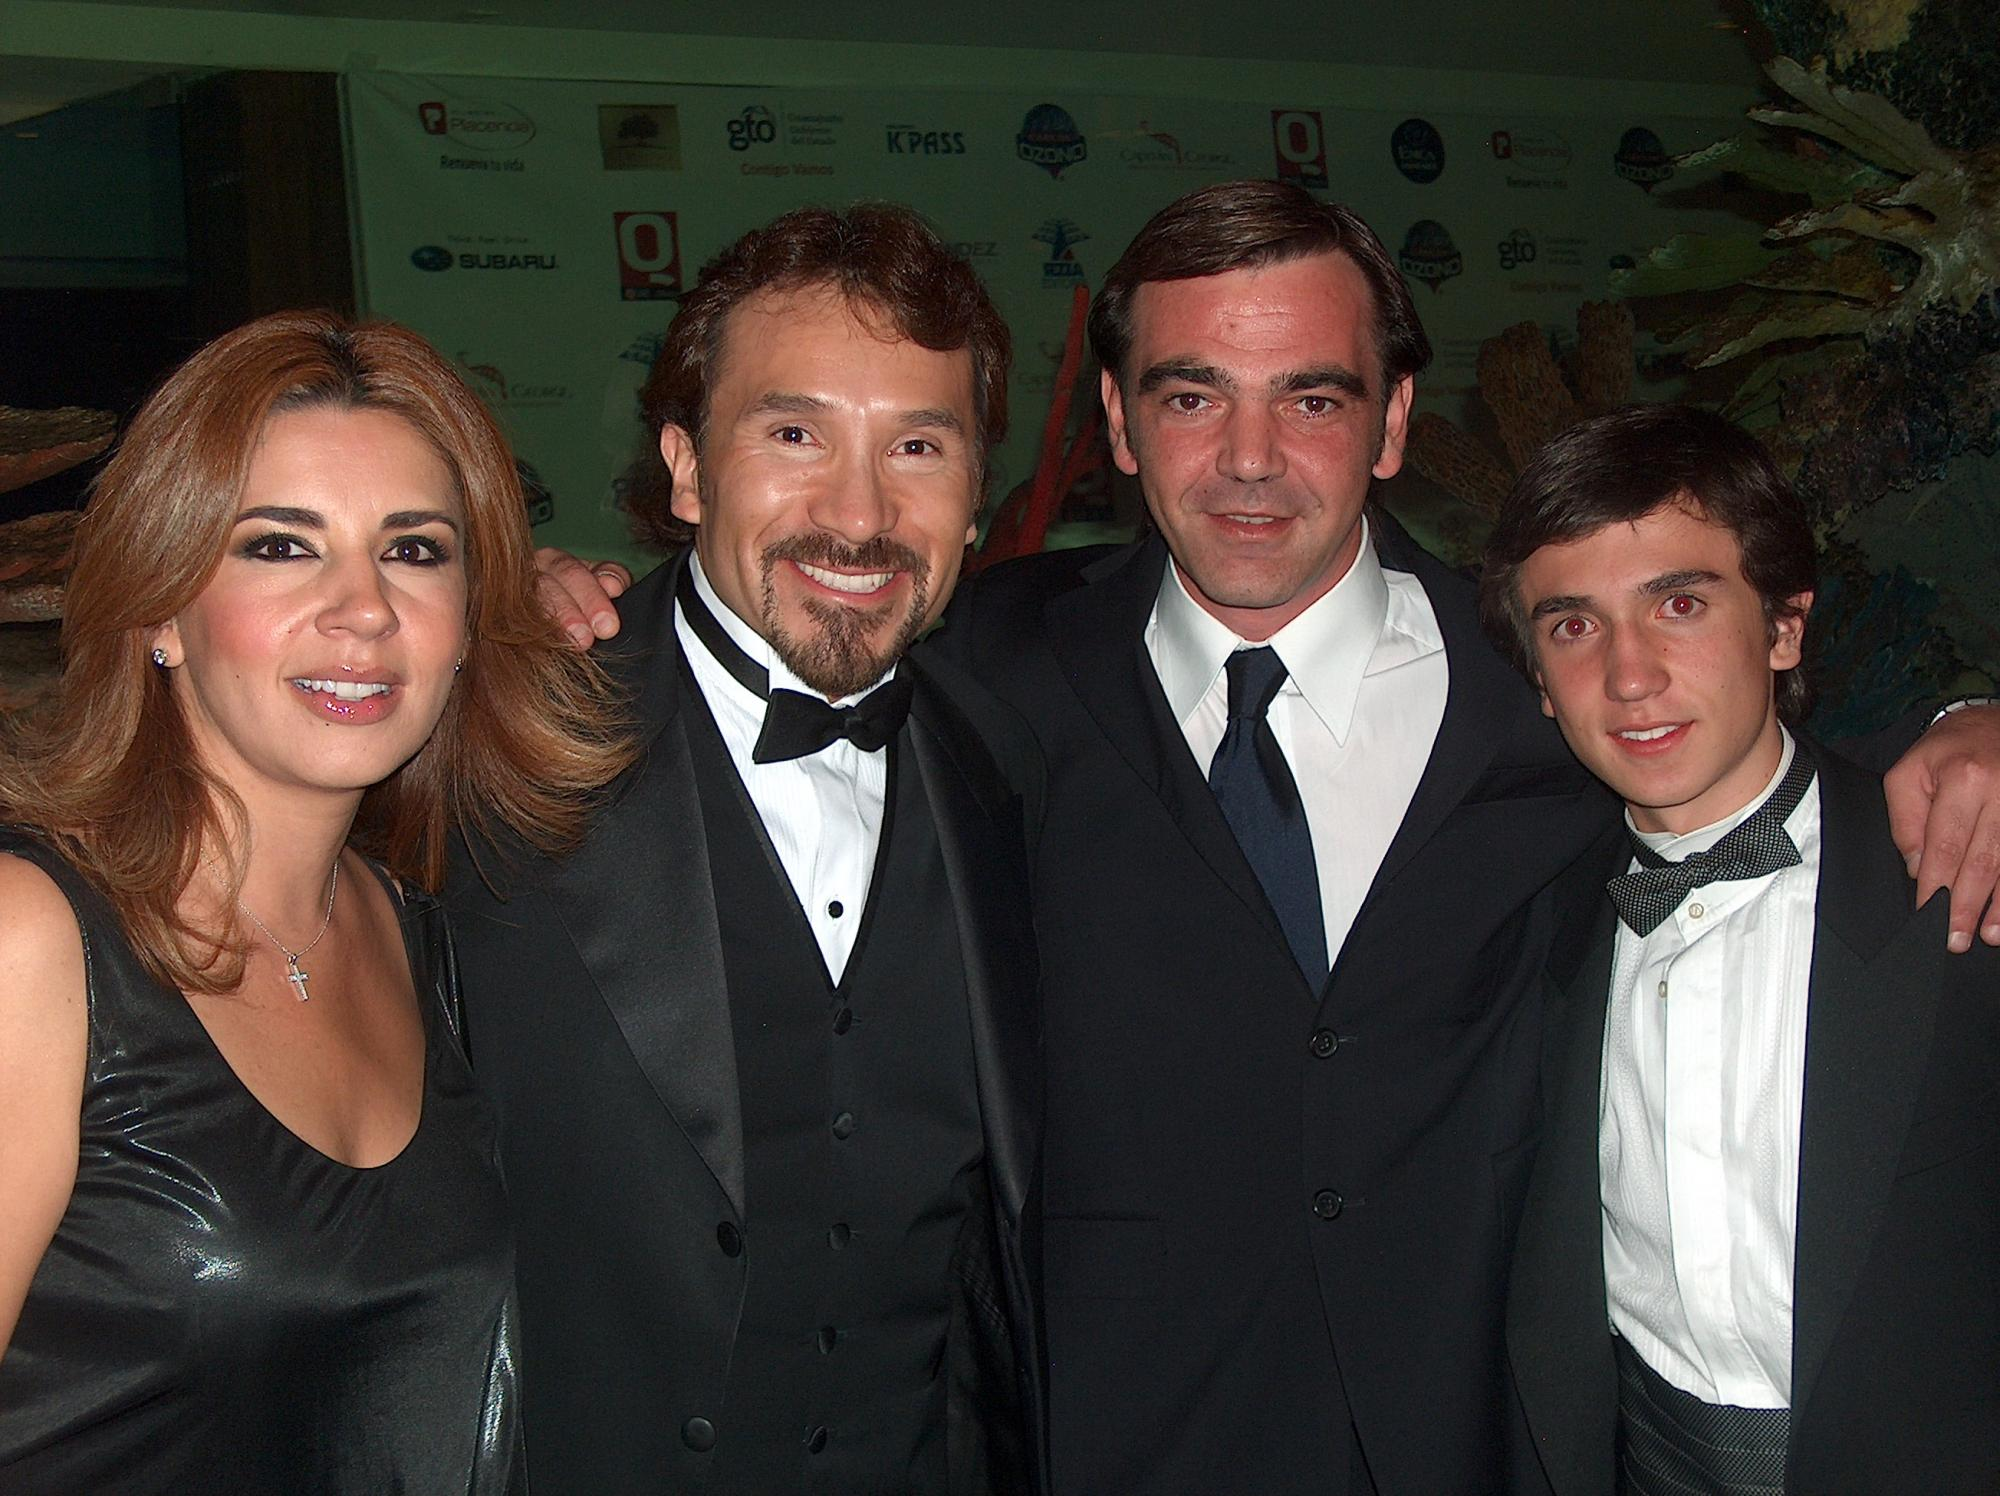 Gloria Marta Cano,Jr. Peluche Luis Manuel Avila, Giuseppe Sorrentino y Miguel Pérez alias Ludoviquito Peluche